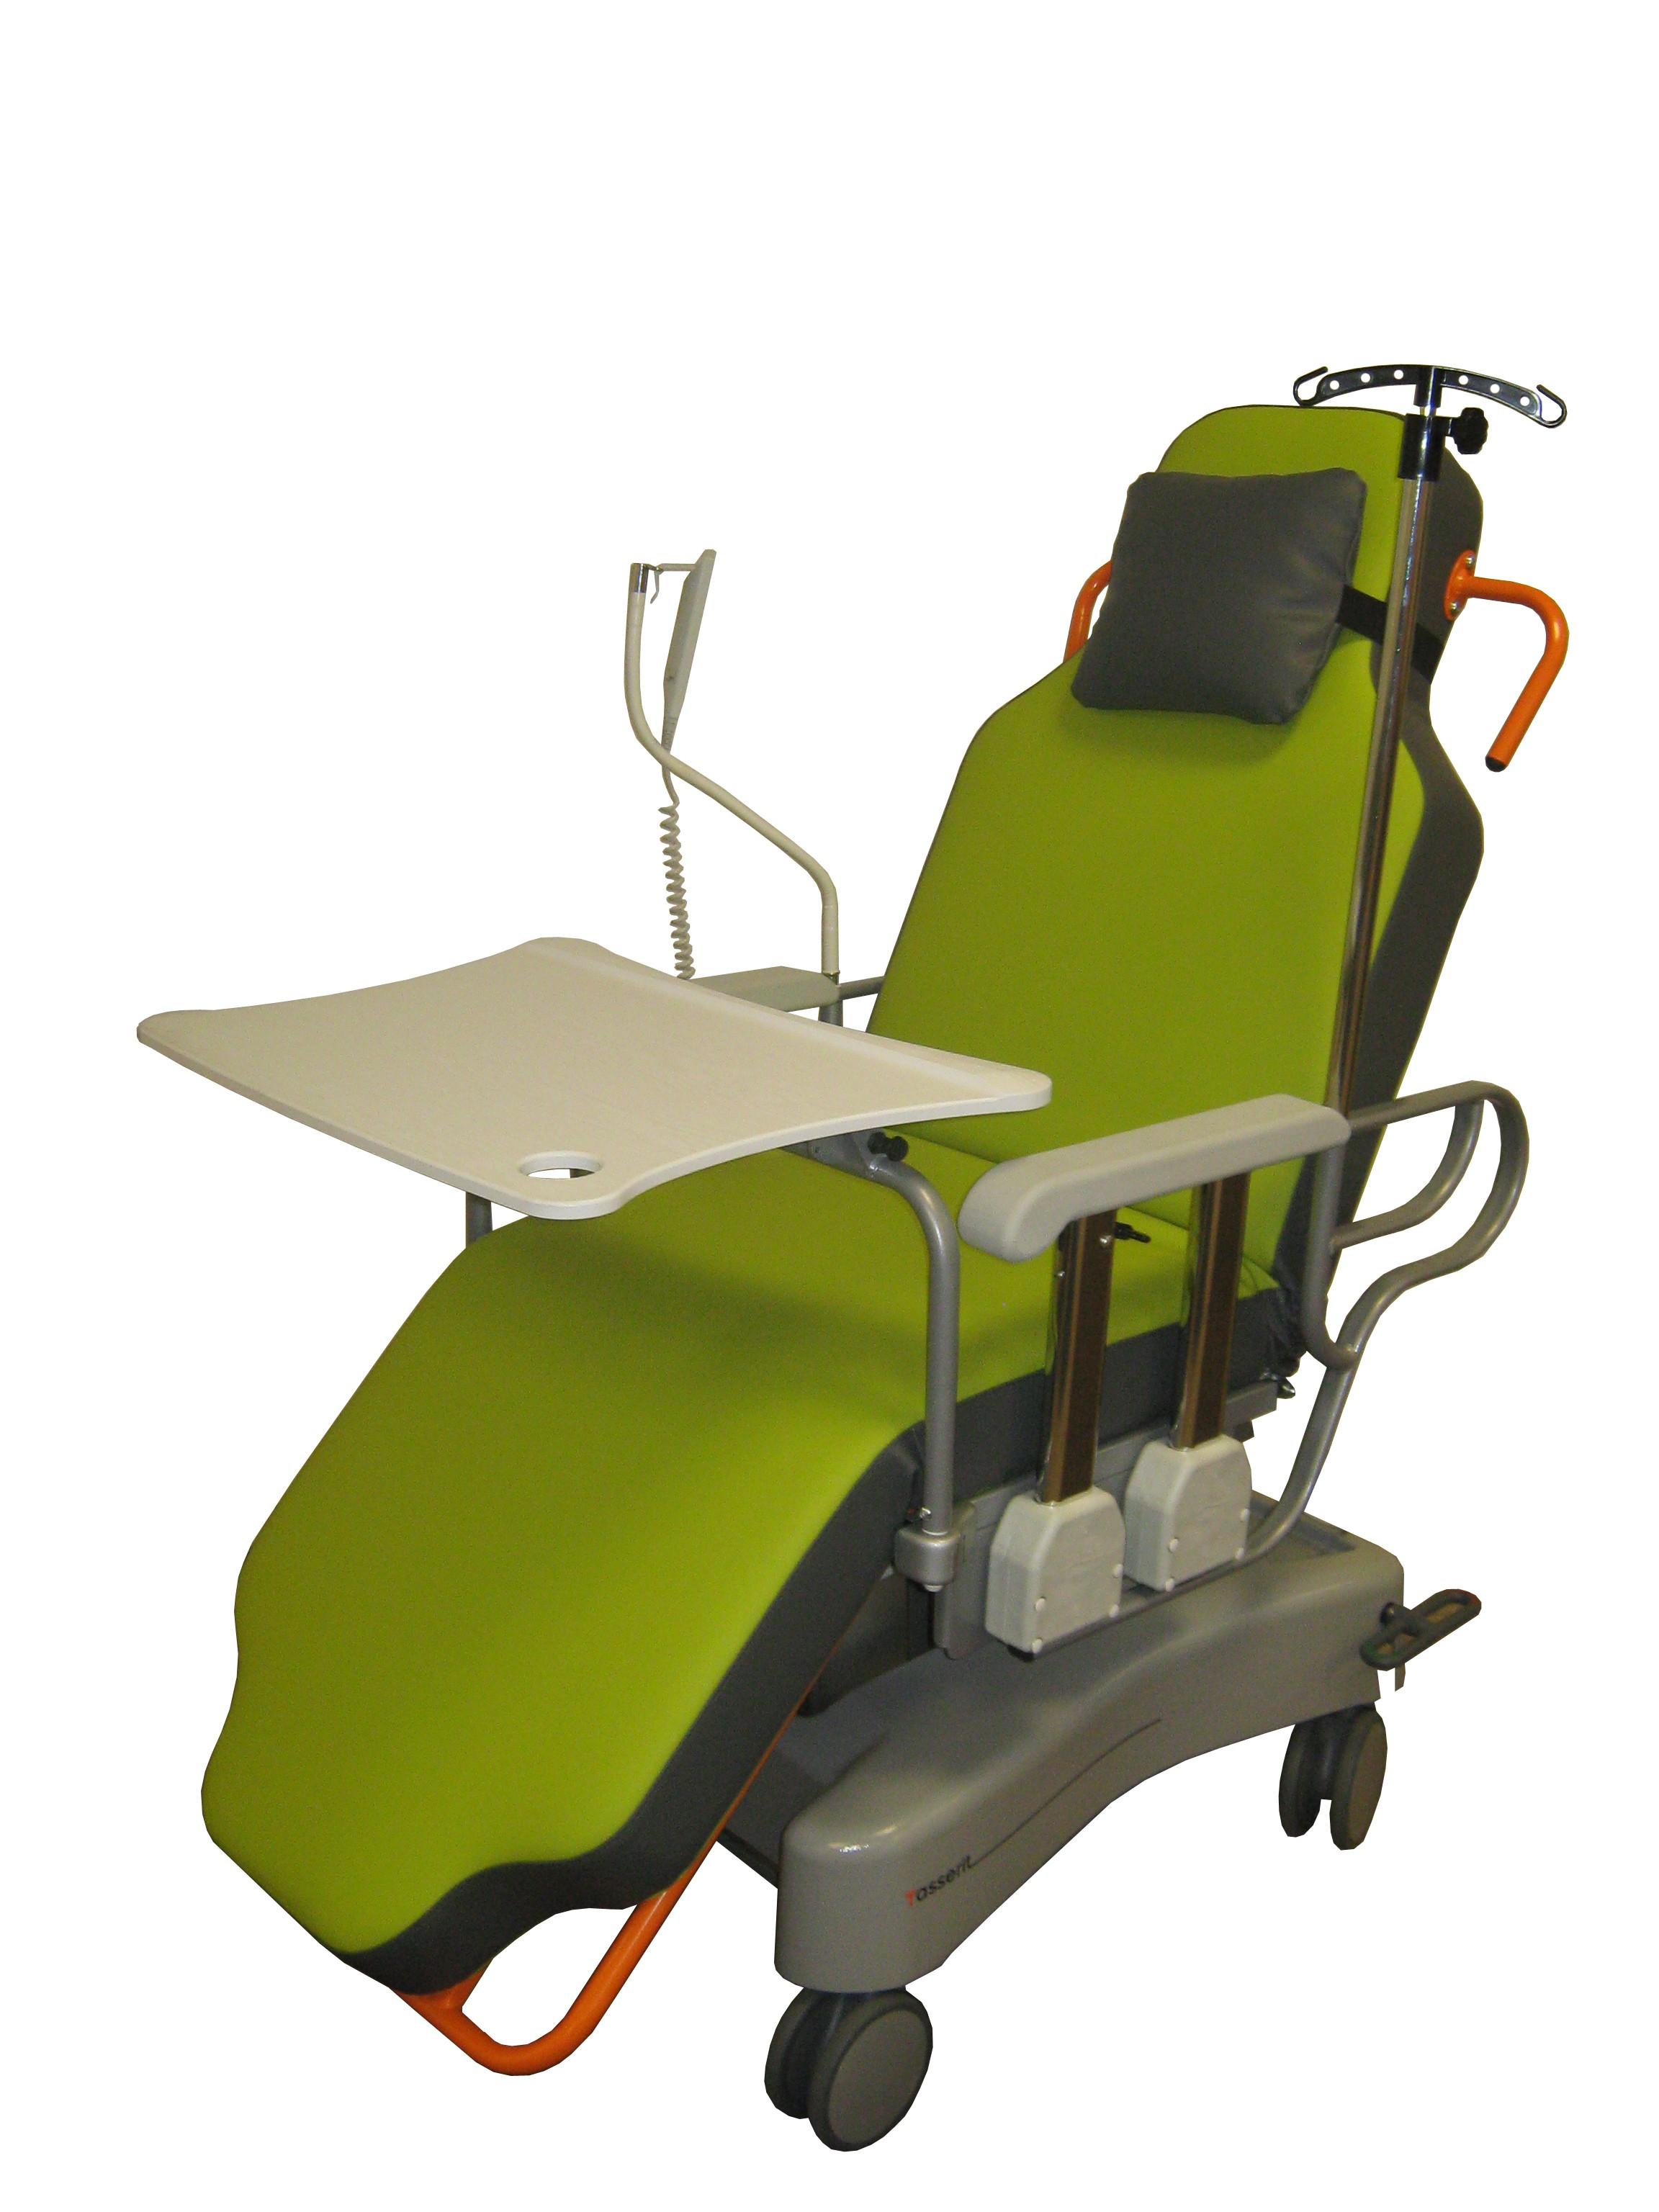 fauteuil de chirurgie ambulatoire ambu one sotec m dical tasserit. Black Bedroom Furniture Sets. Home Design Ideas